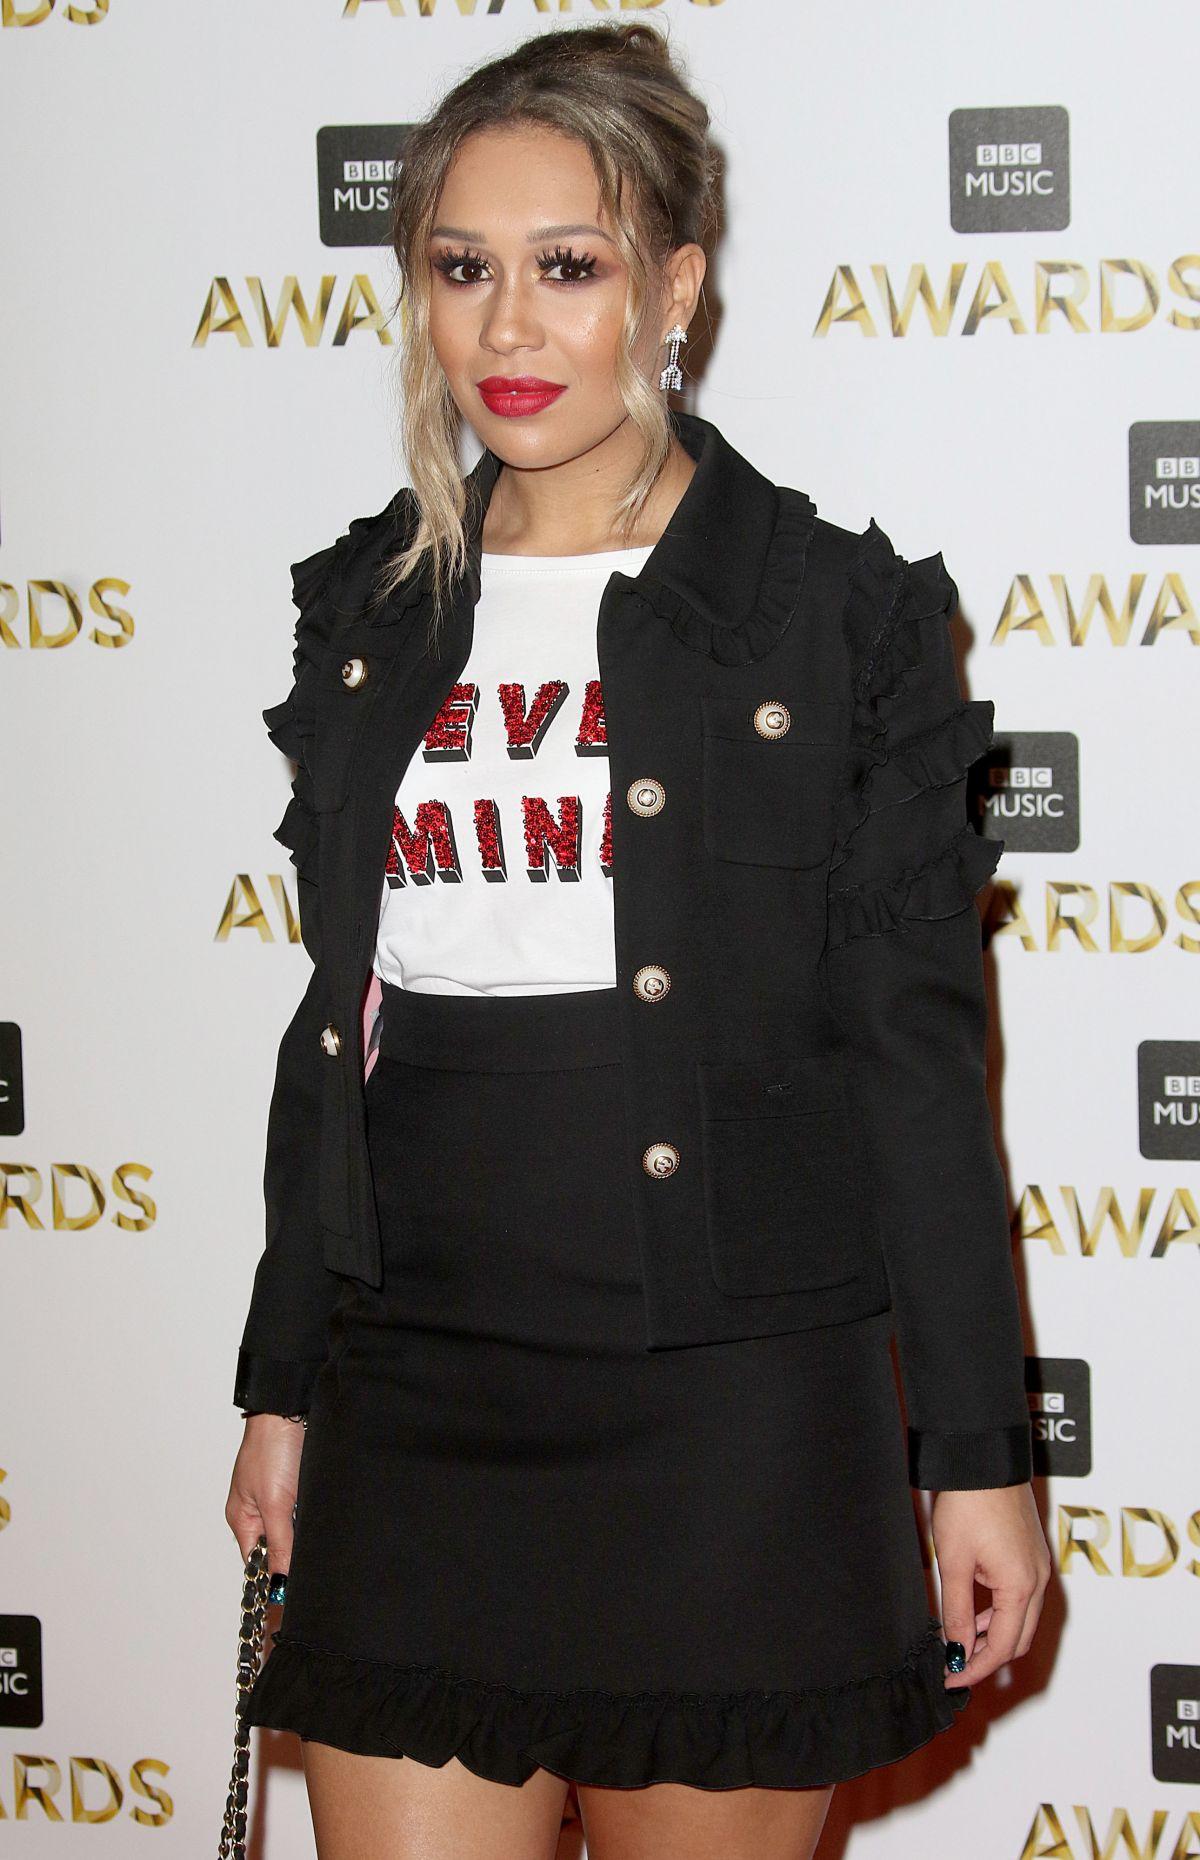 REBECCA FERGUSON at BBC Music Awards in London 12/12/2016